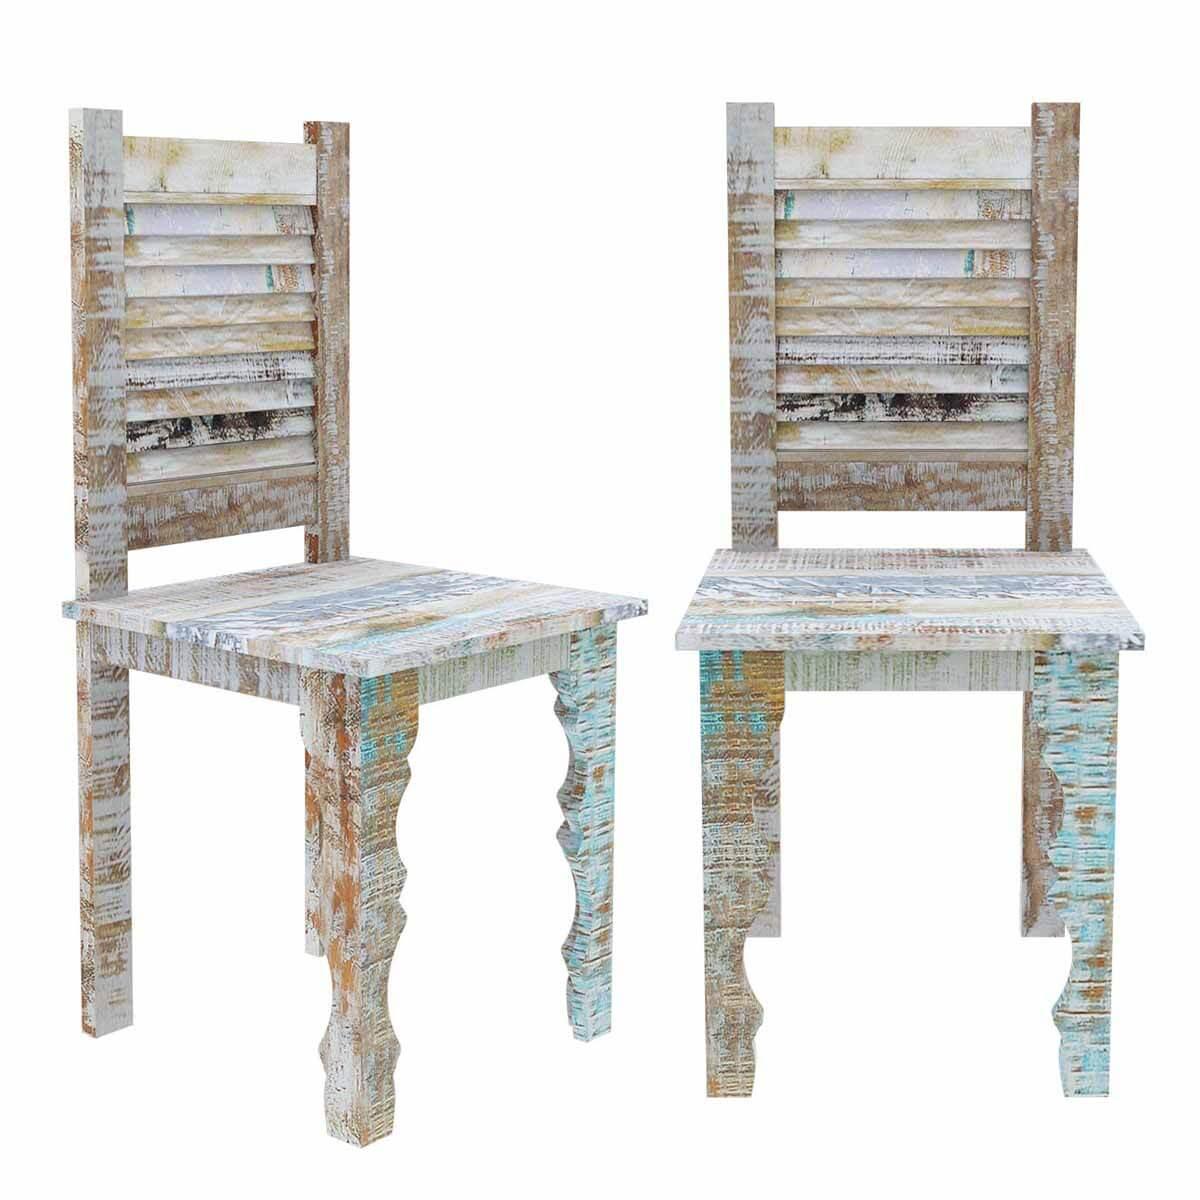 Oklahoma Rustic Reclaimed Wood Shutter Back Dining Chair (Set of 2) - Rustic Reclaimed Wood Furniture Dining Table & Shutter Back Chair Set